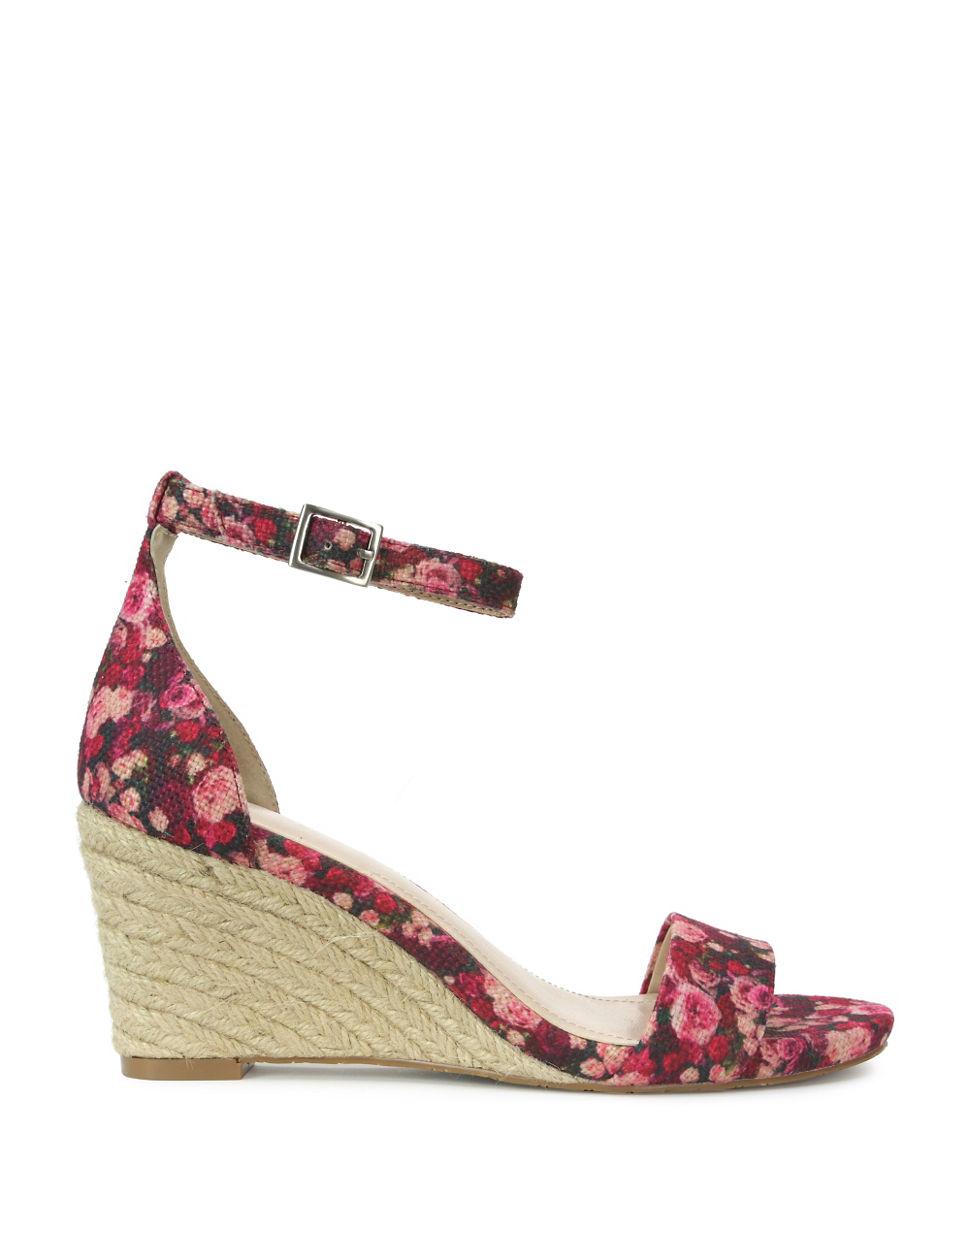 11073f6735f Lyst tahari florence floral wedge sandals in pink jpg 970x1245 Purple pink  wedges